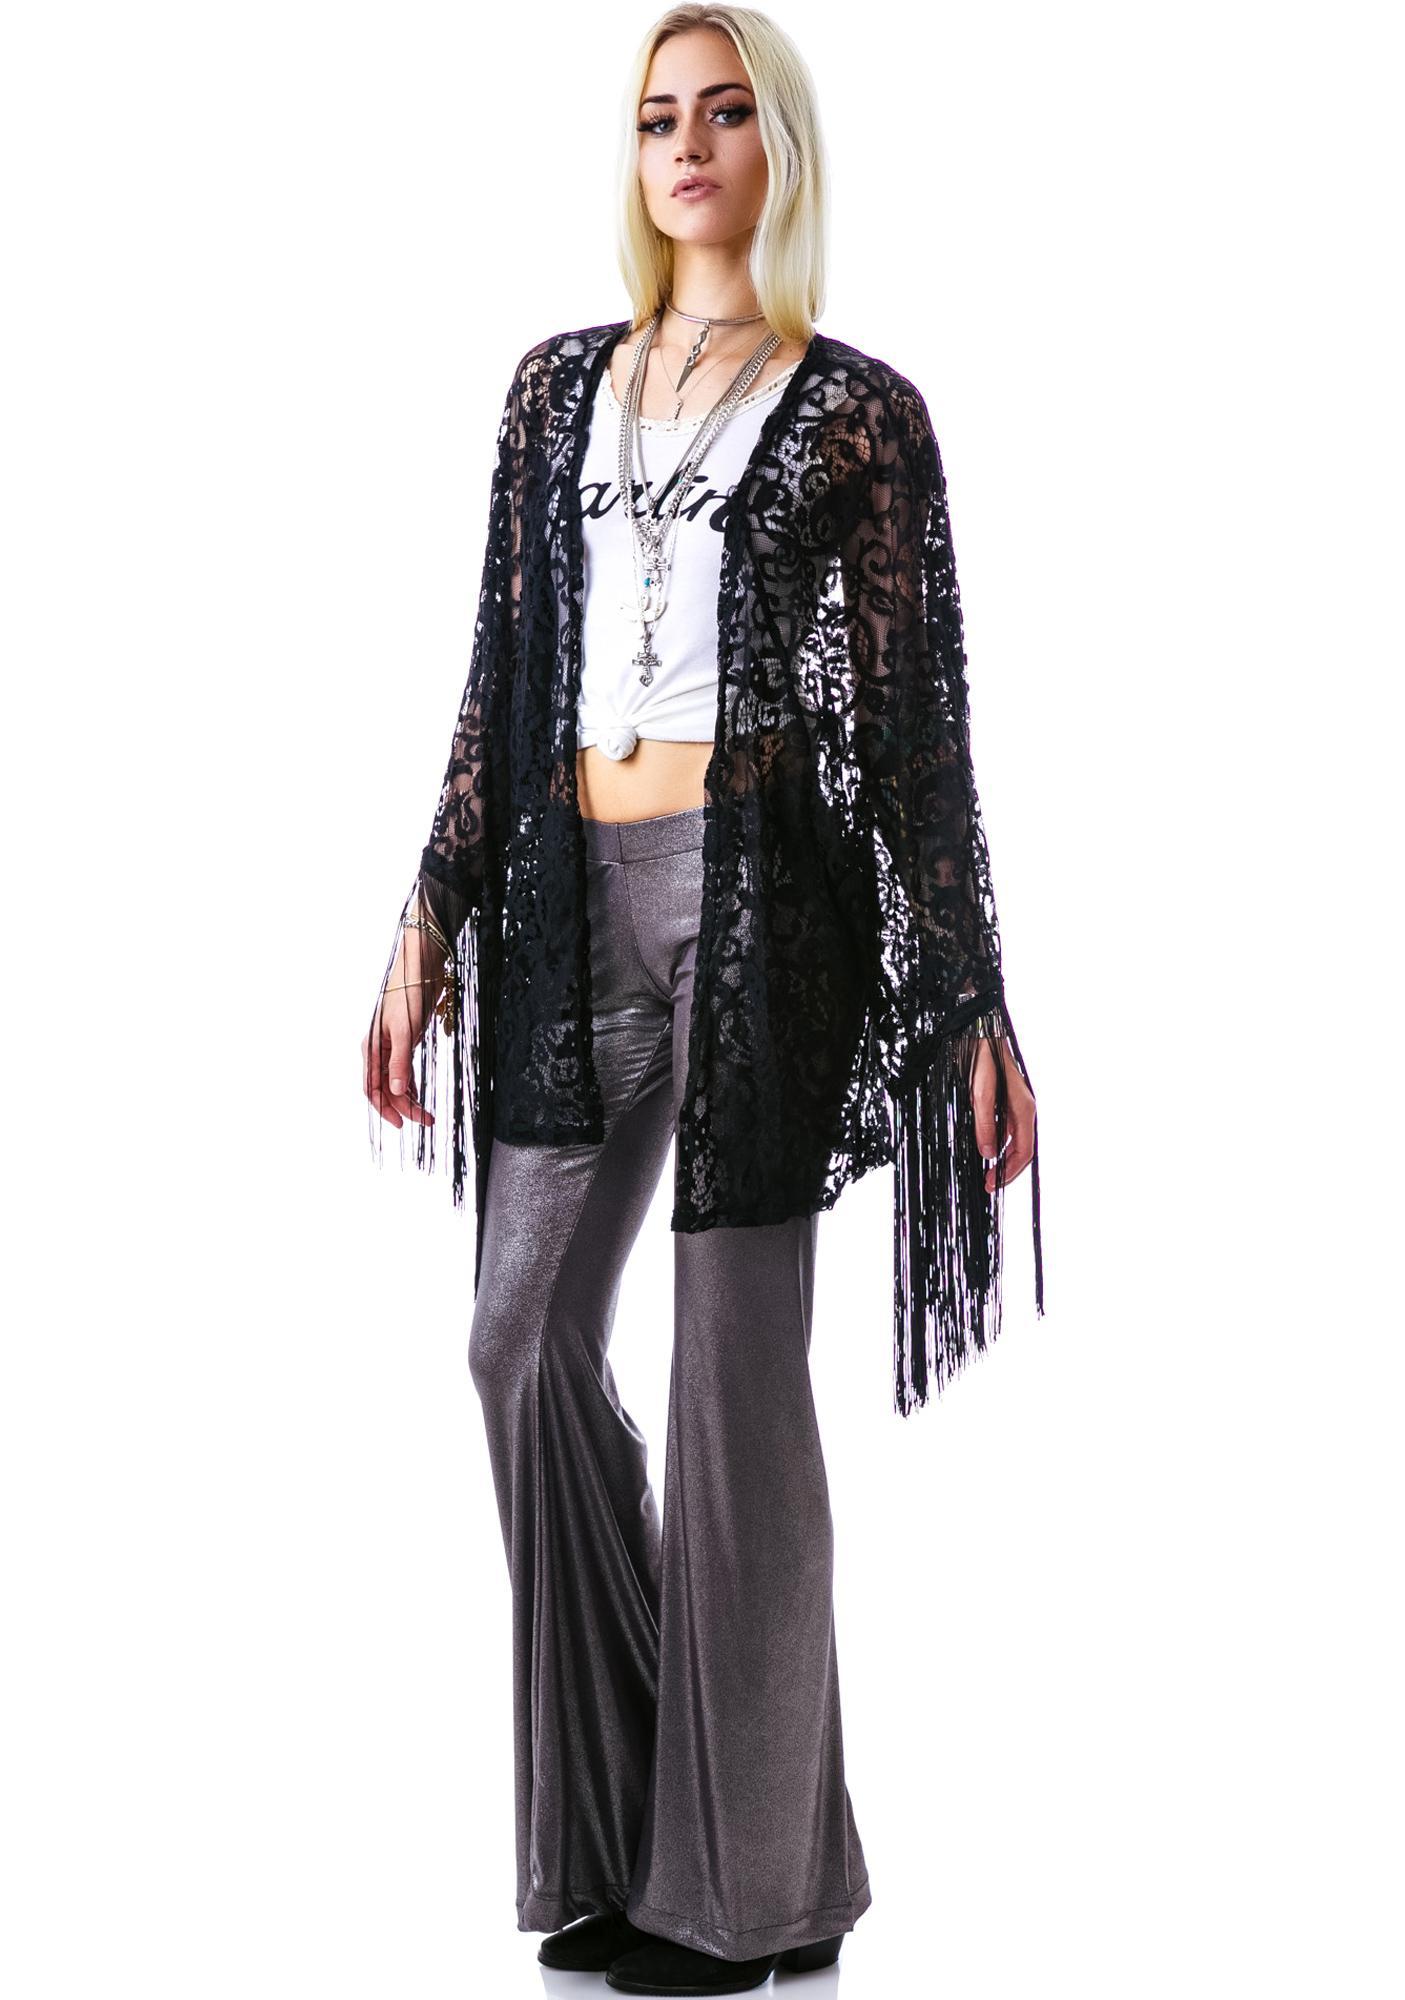 Livin' On The Fringe Kimono